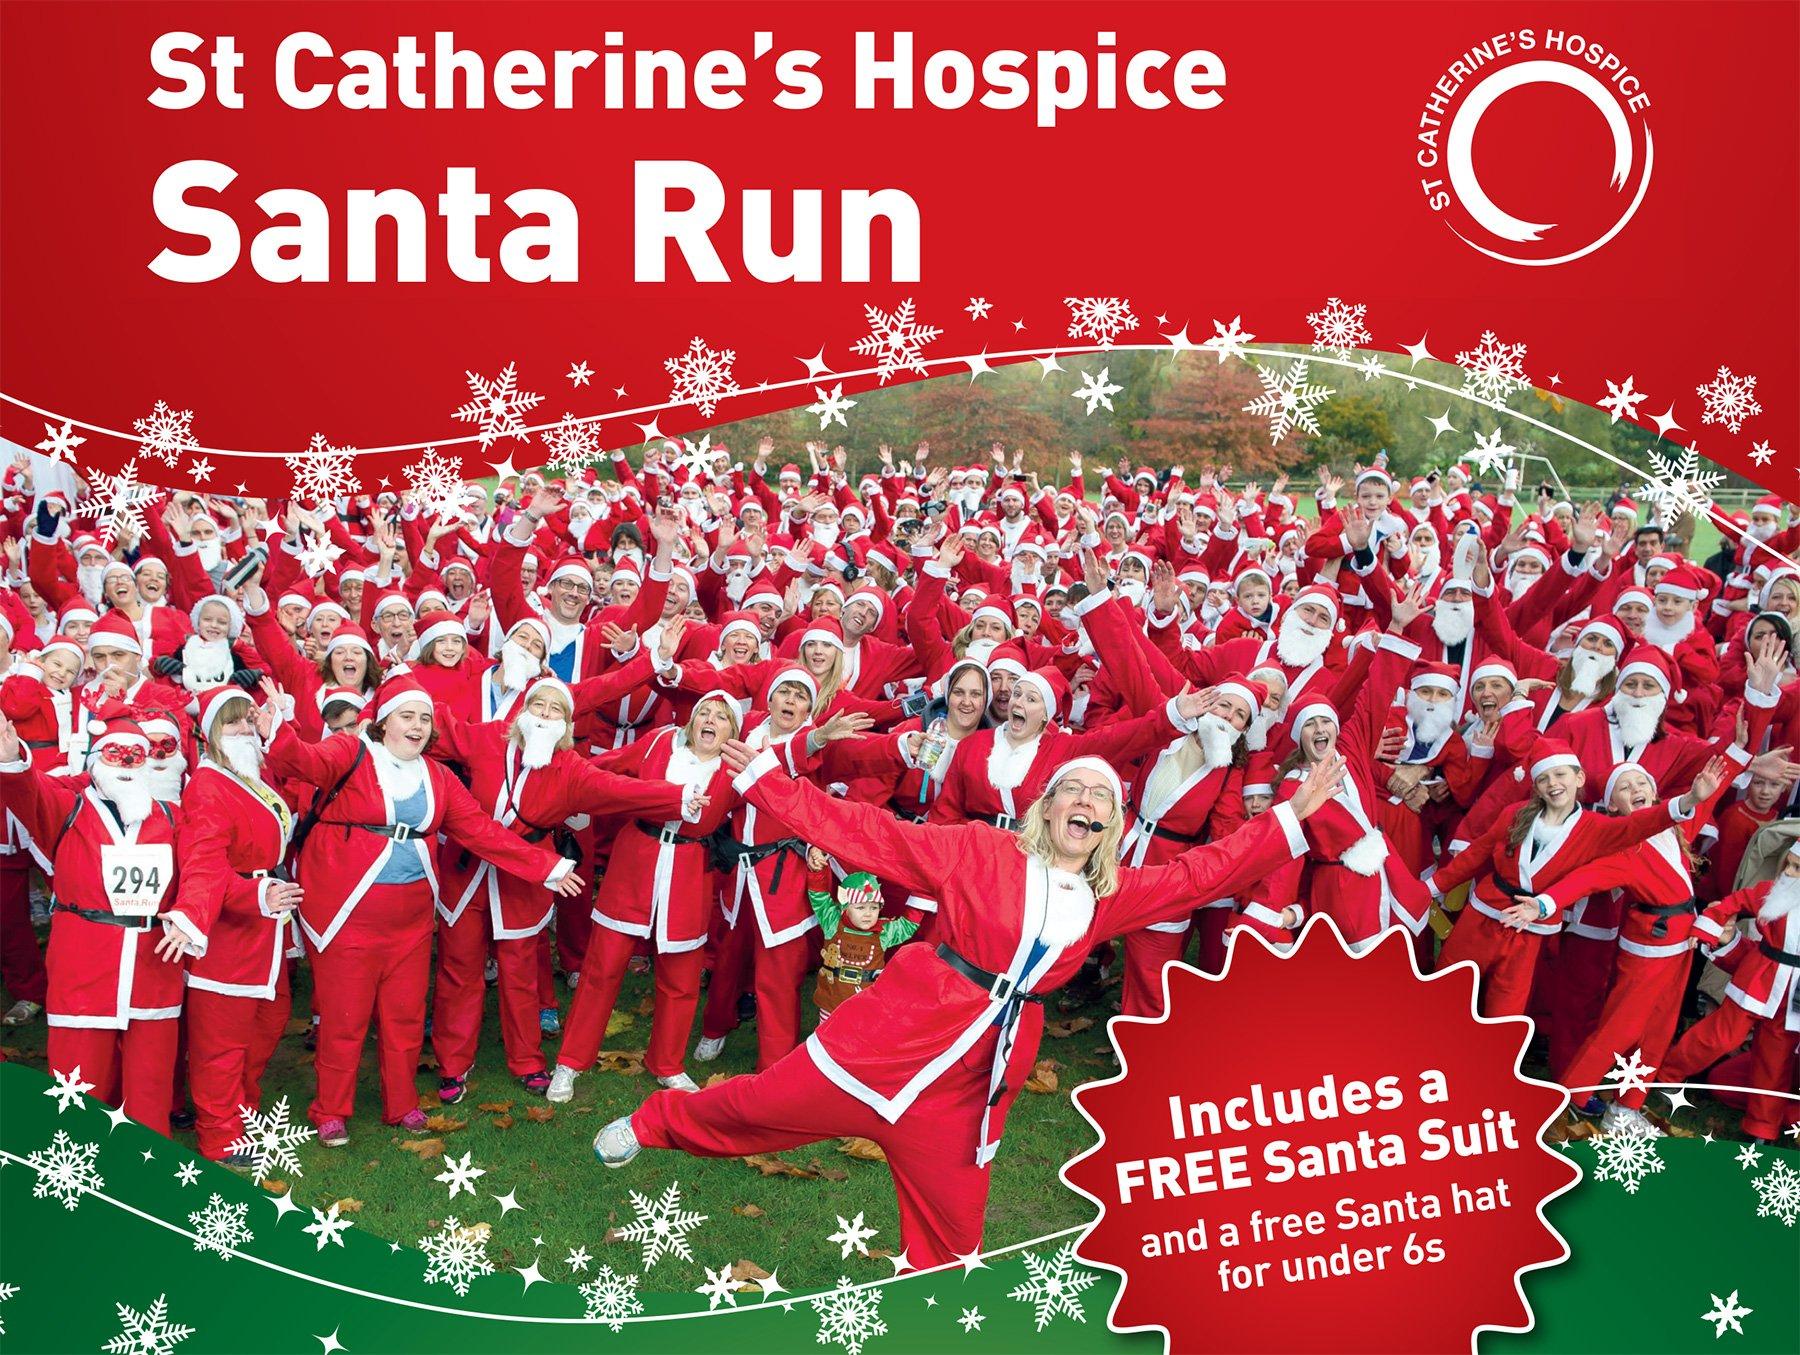 St. Catherine's Hospice Santa Run at Chartham Park